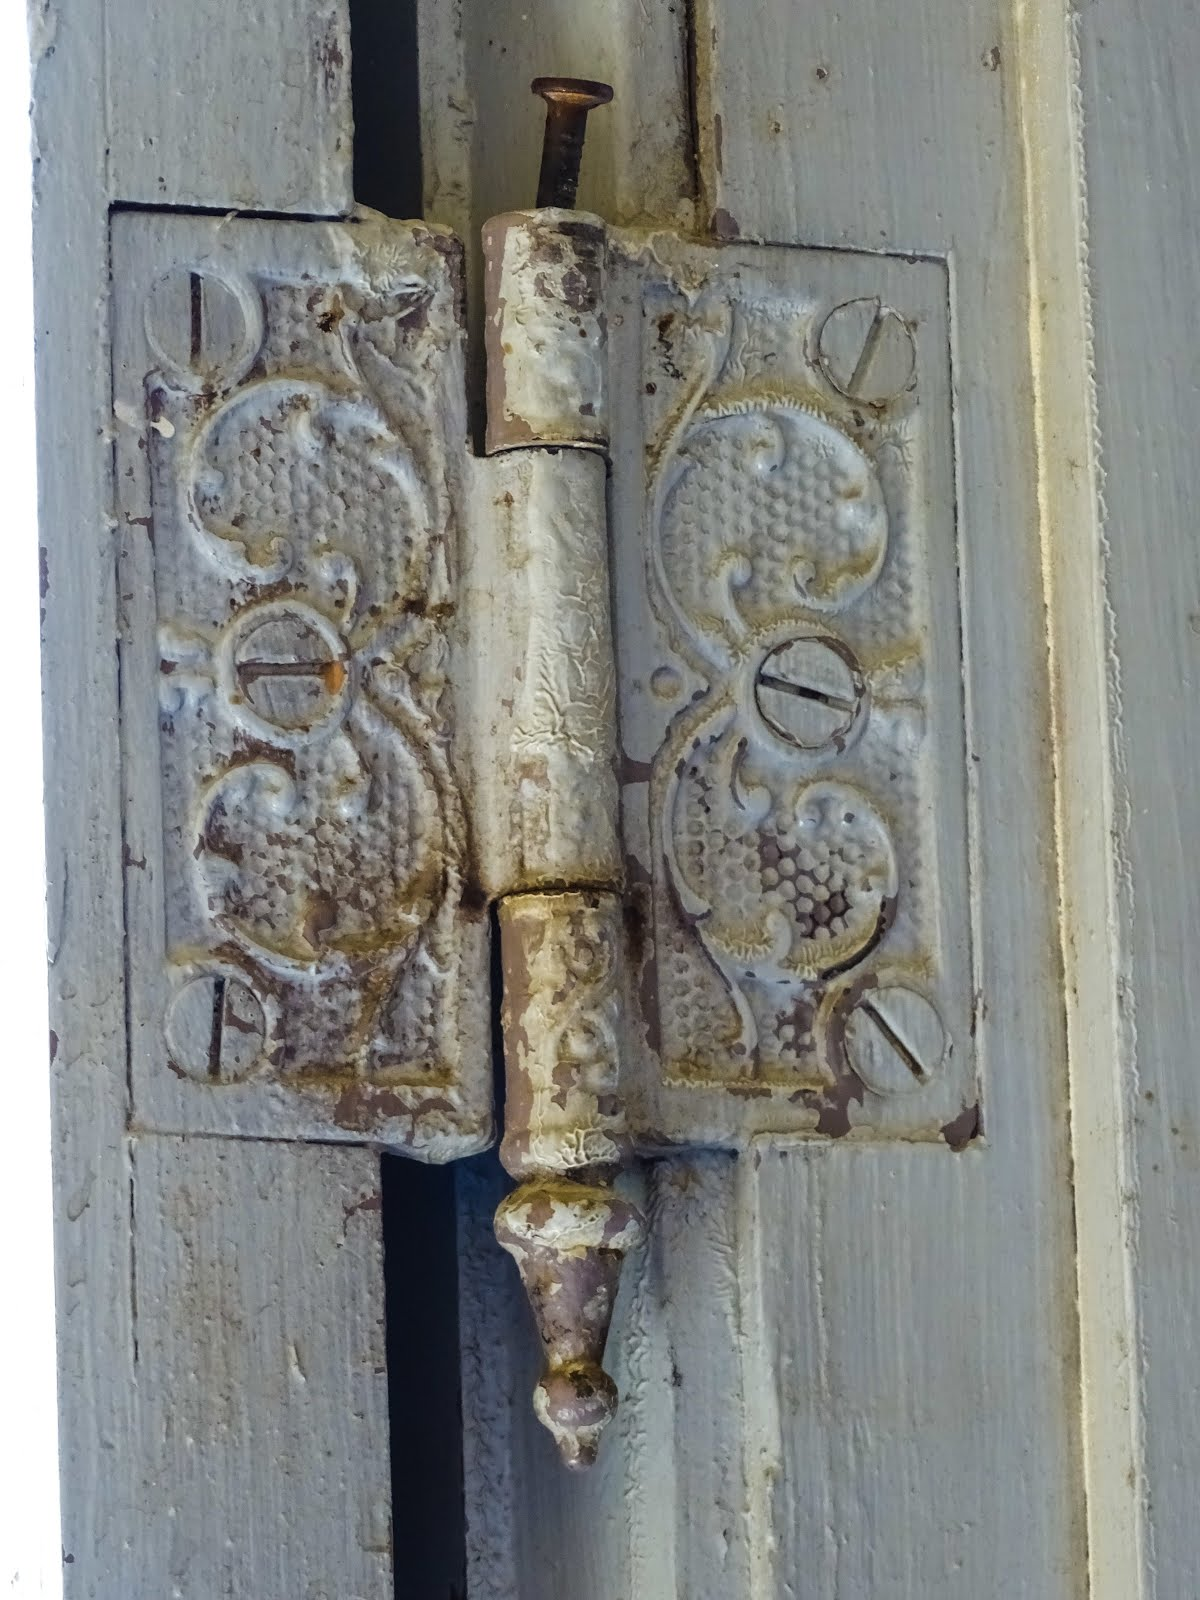 A Decorative Door Hinge & A Decorative Door Hinge | Walking Arizona